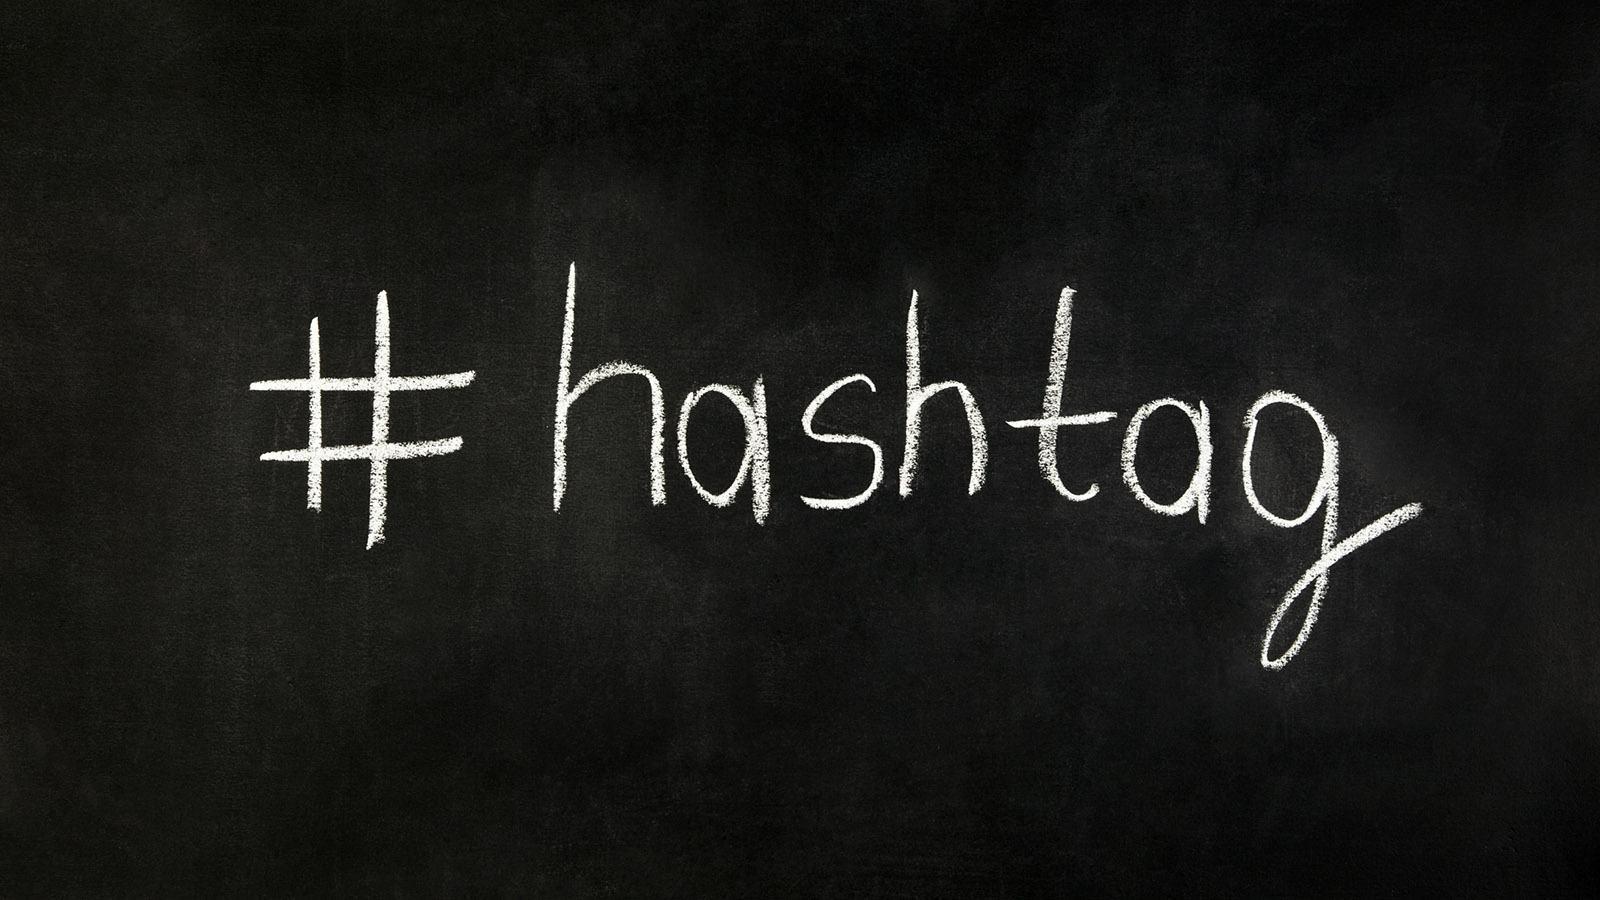 Hashtag - Para que serve?